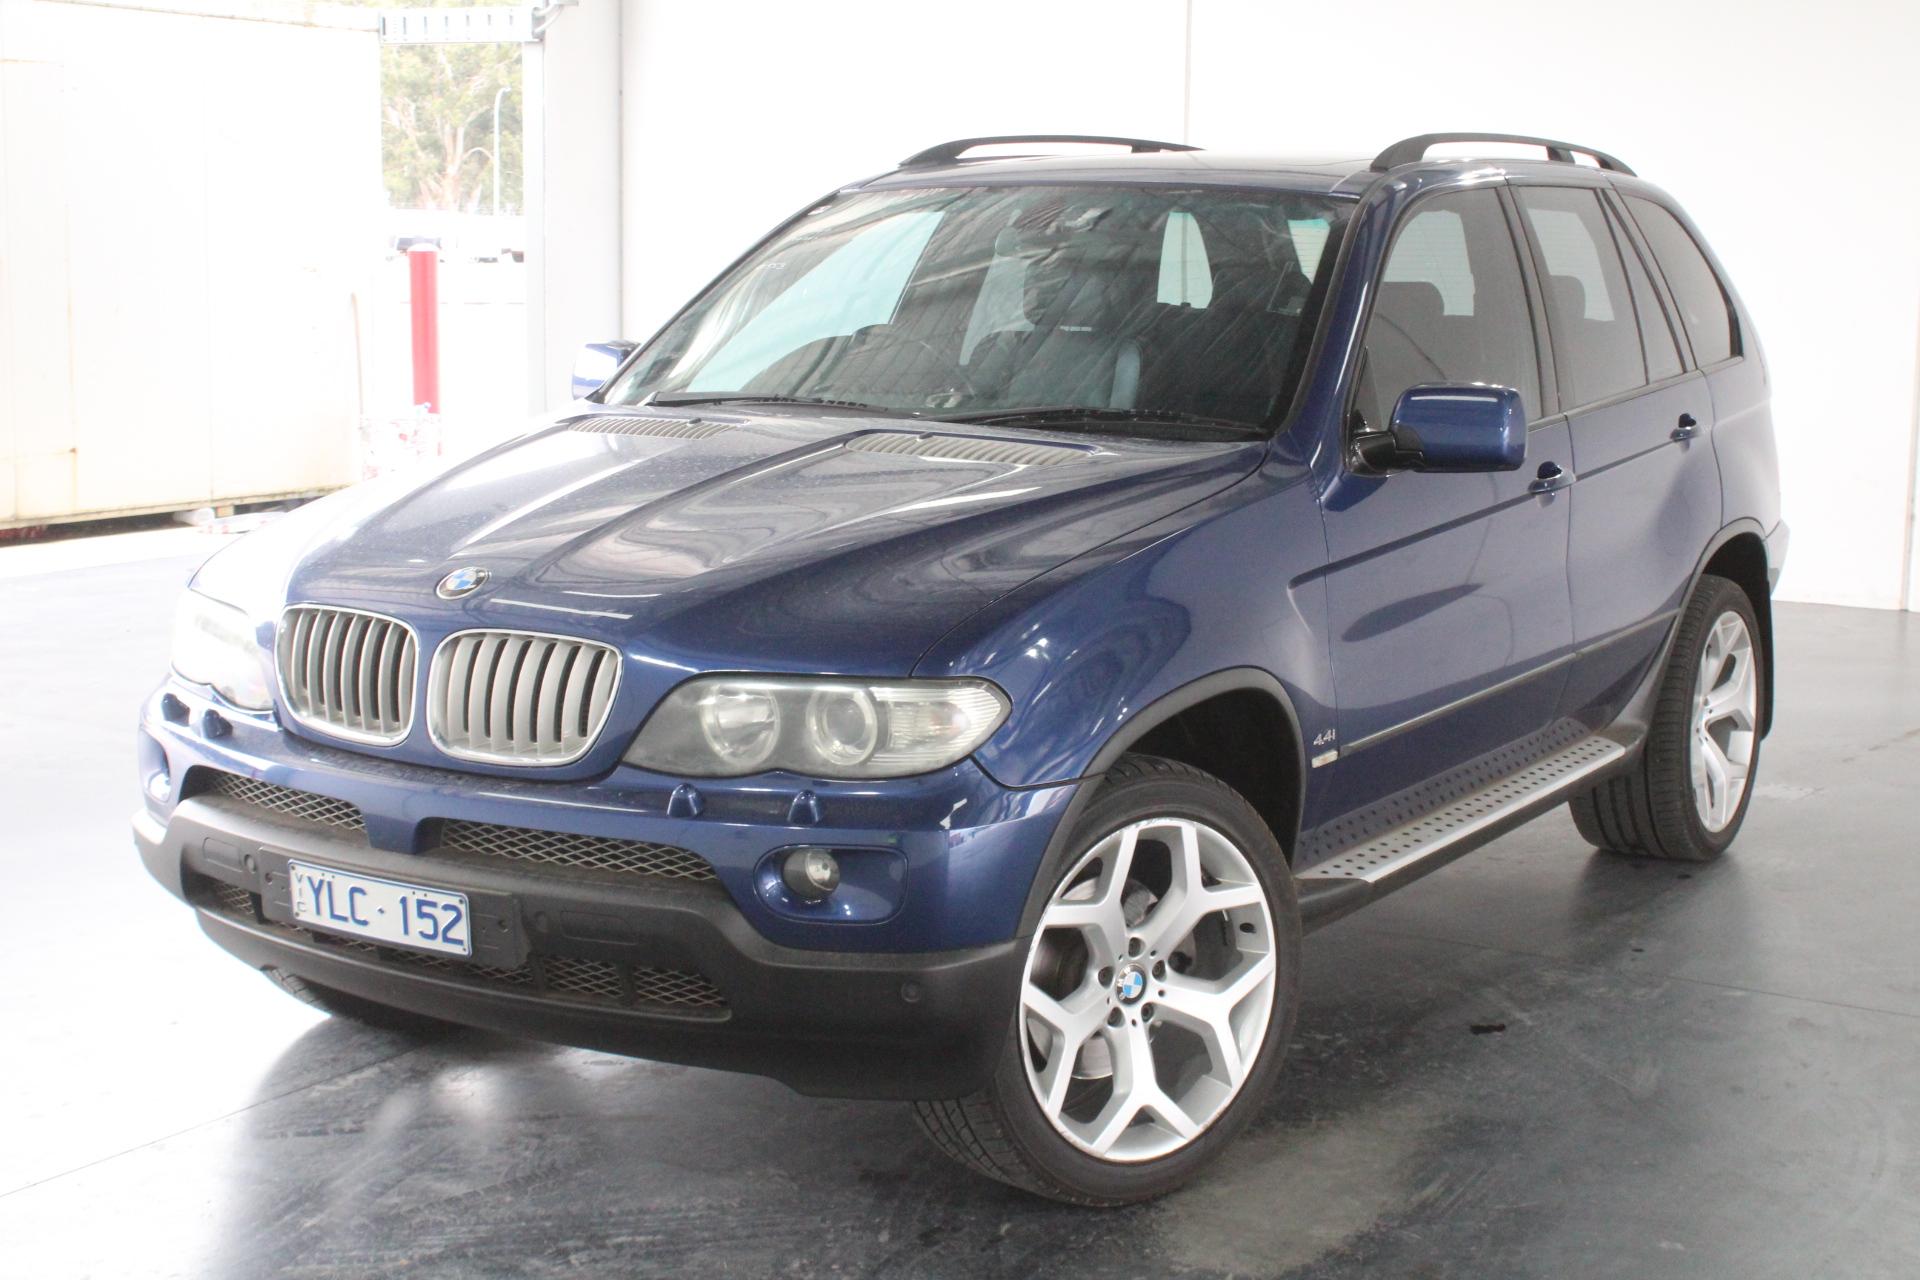 2005 BMW X5 4.4i E53 Automatic Wagon